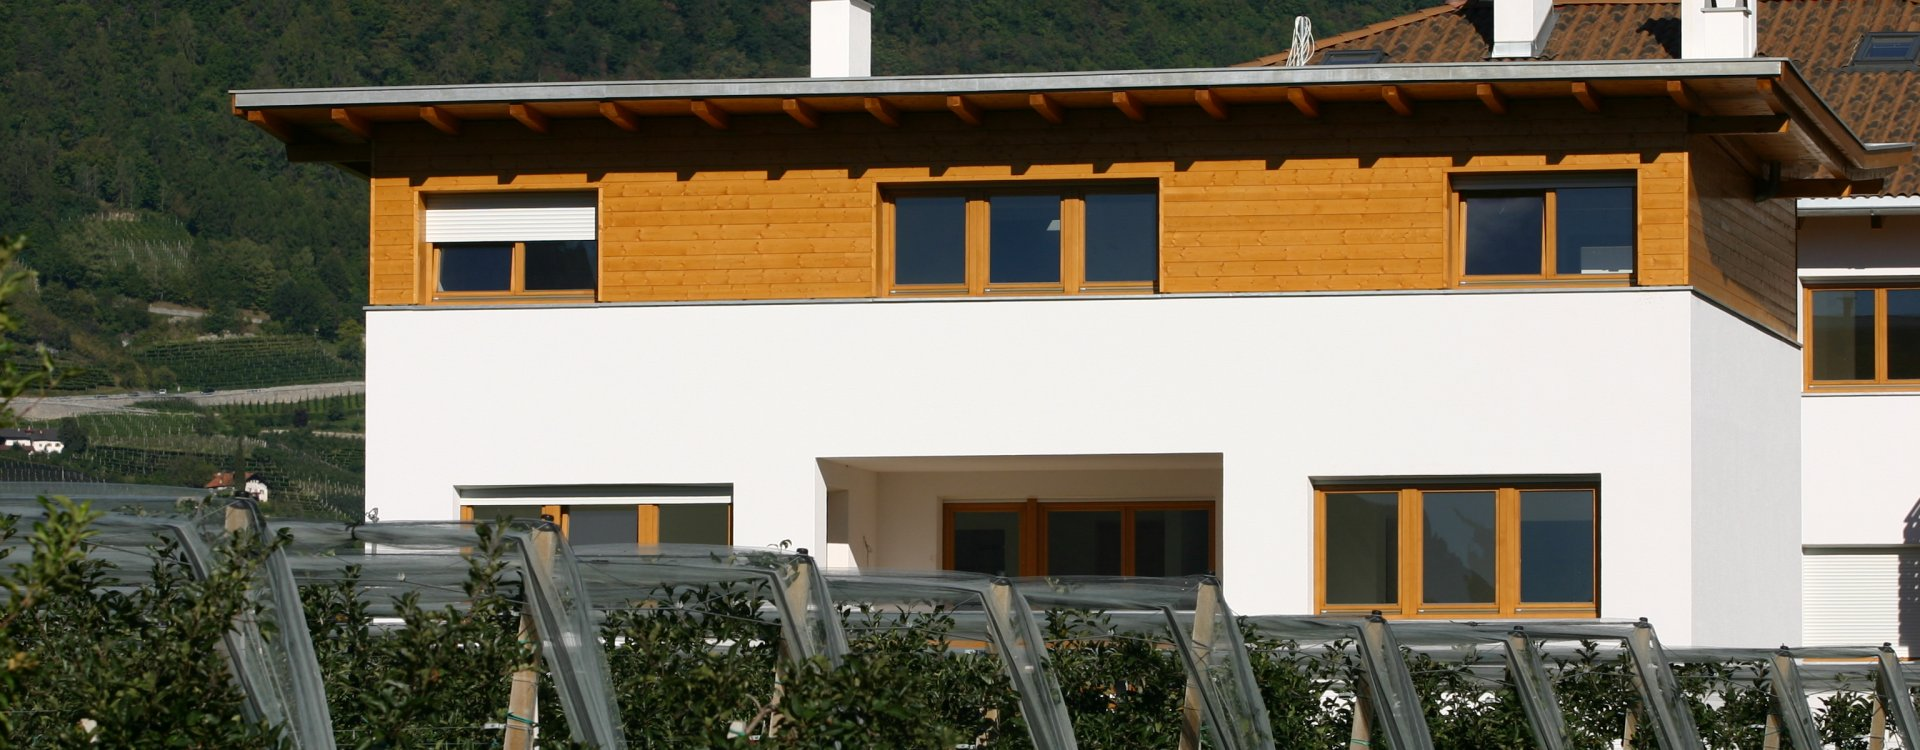 g22 projects multi family house kogner. Black Bedroom Furniture Sets. Home Design Ideas